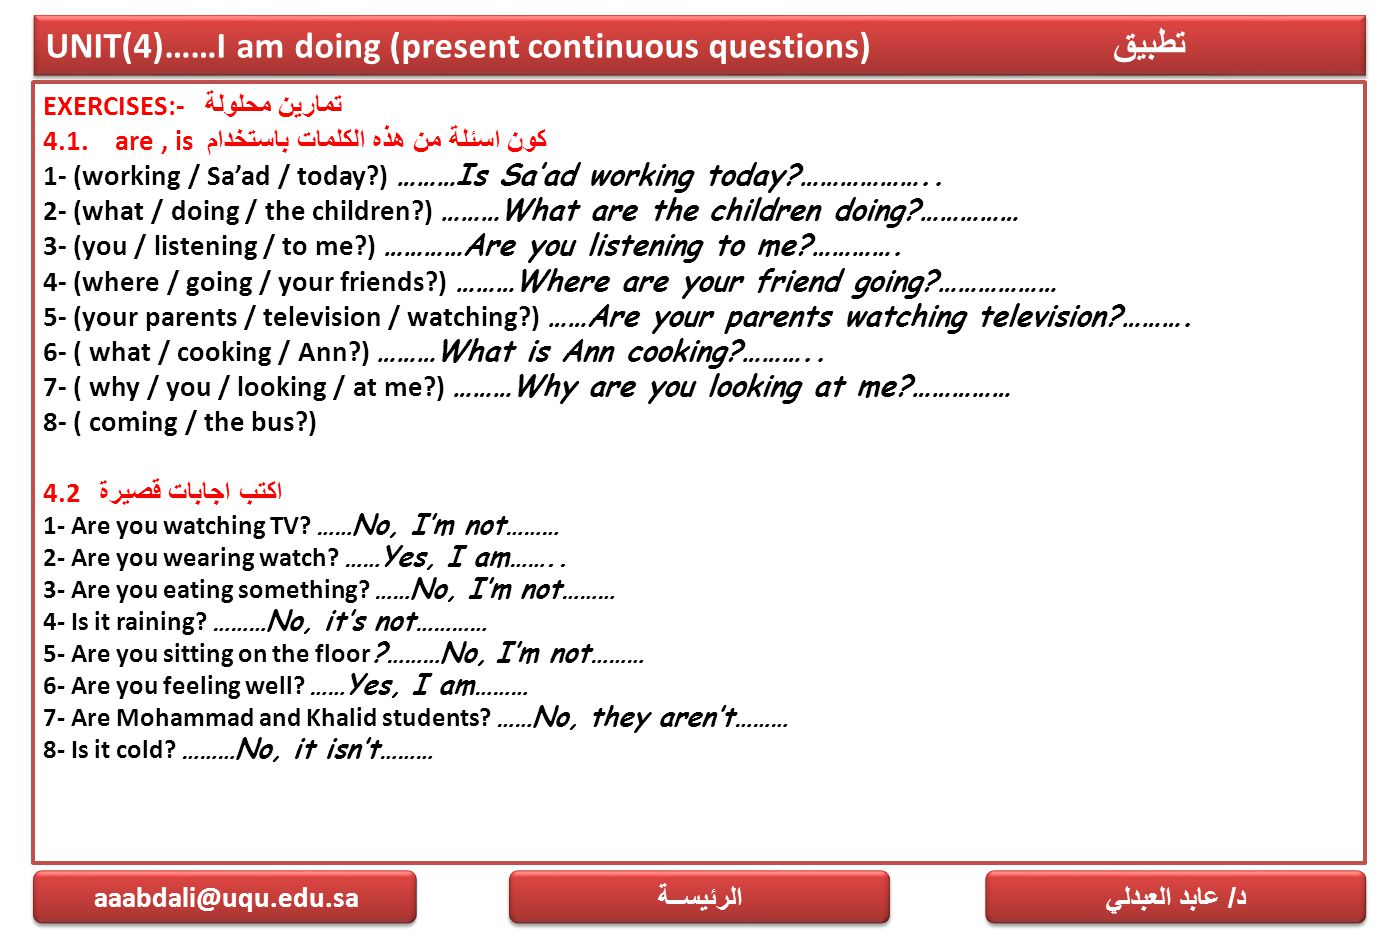 UNIT(4)……I am doing (present continuous questions) تطبيق